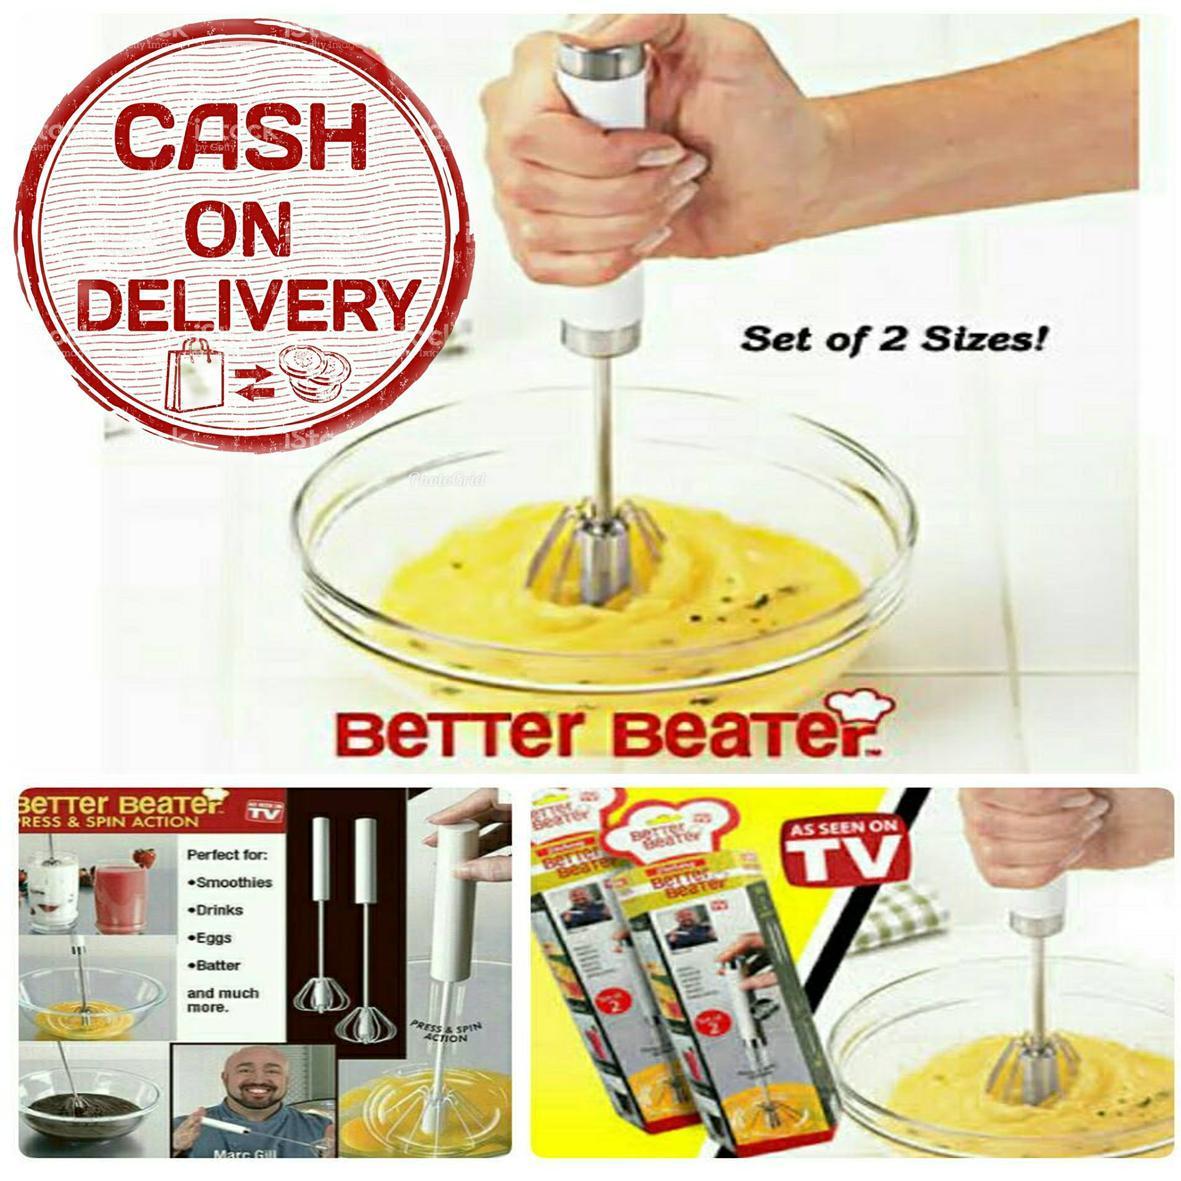 Jual Alat Mixer Terbaru Airlux Hand Hm 3060 Sien Collection Better Beater Set Pengocok Telur Praktis Rotatable